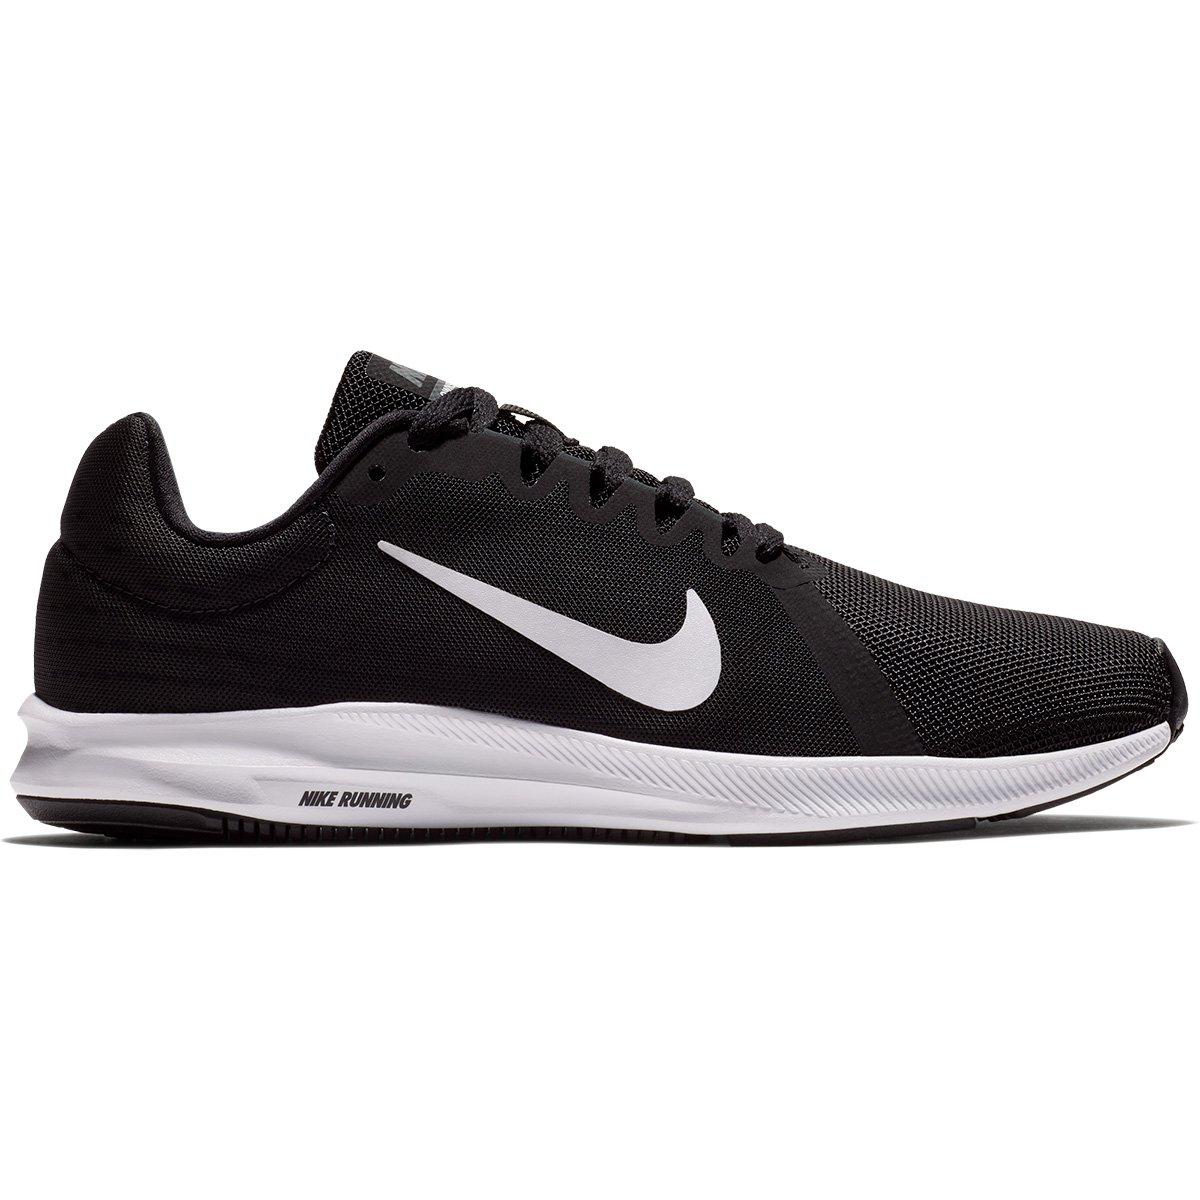 Tênis Nike Wmns Downshifter 8 Feminino - Preto e Branco - Compre Agora  fda485e426bdc